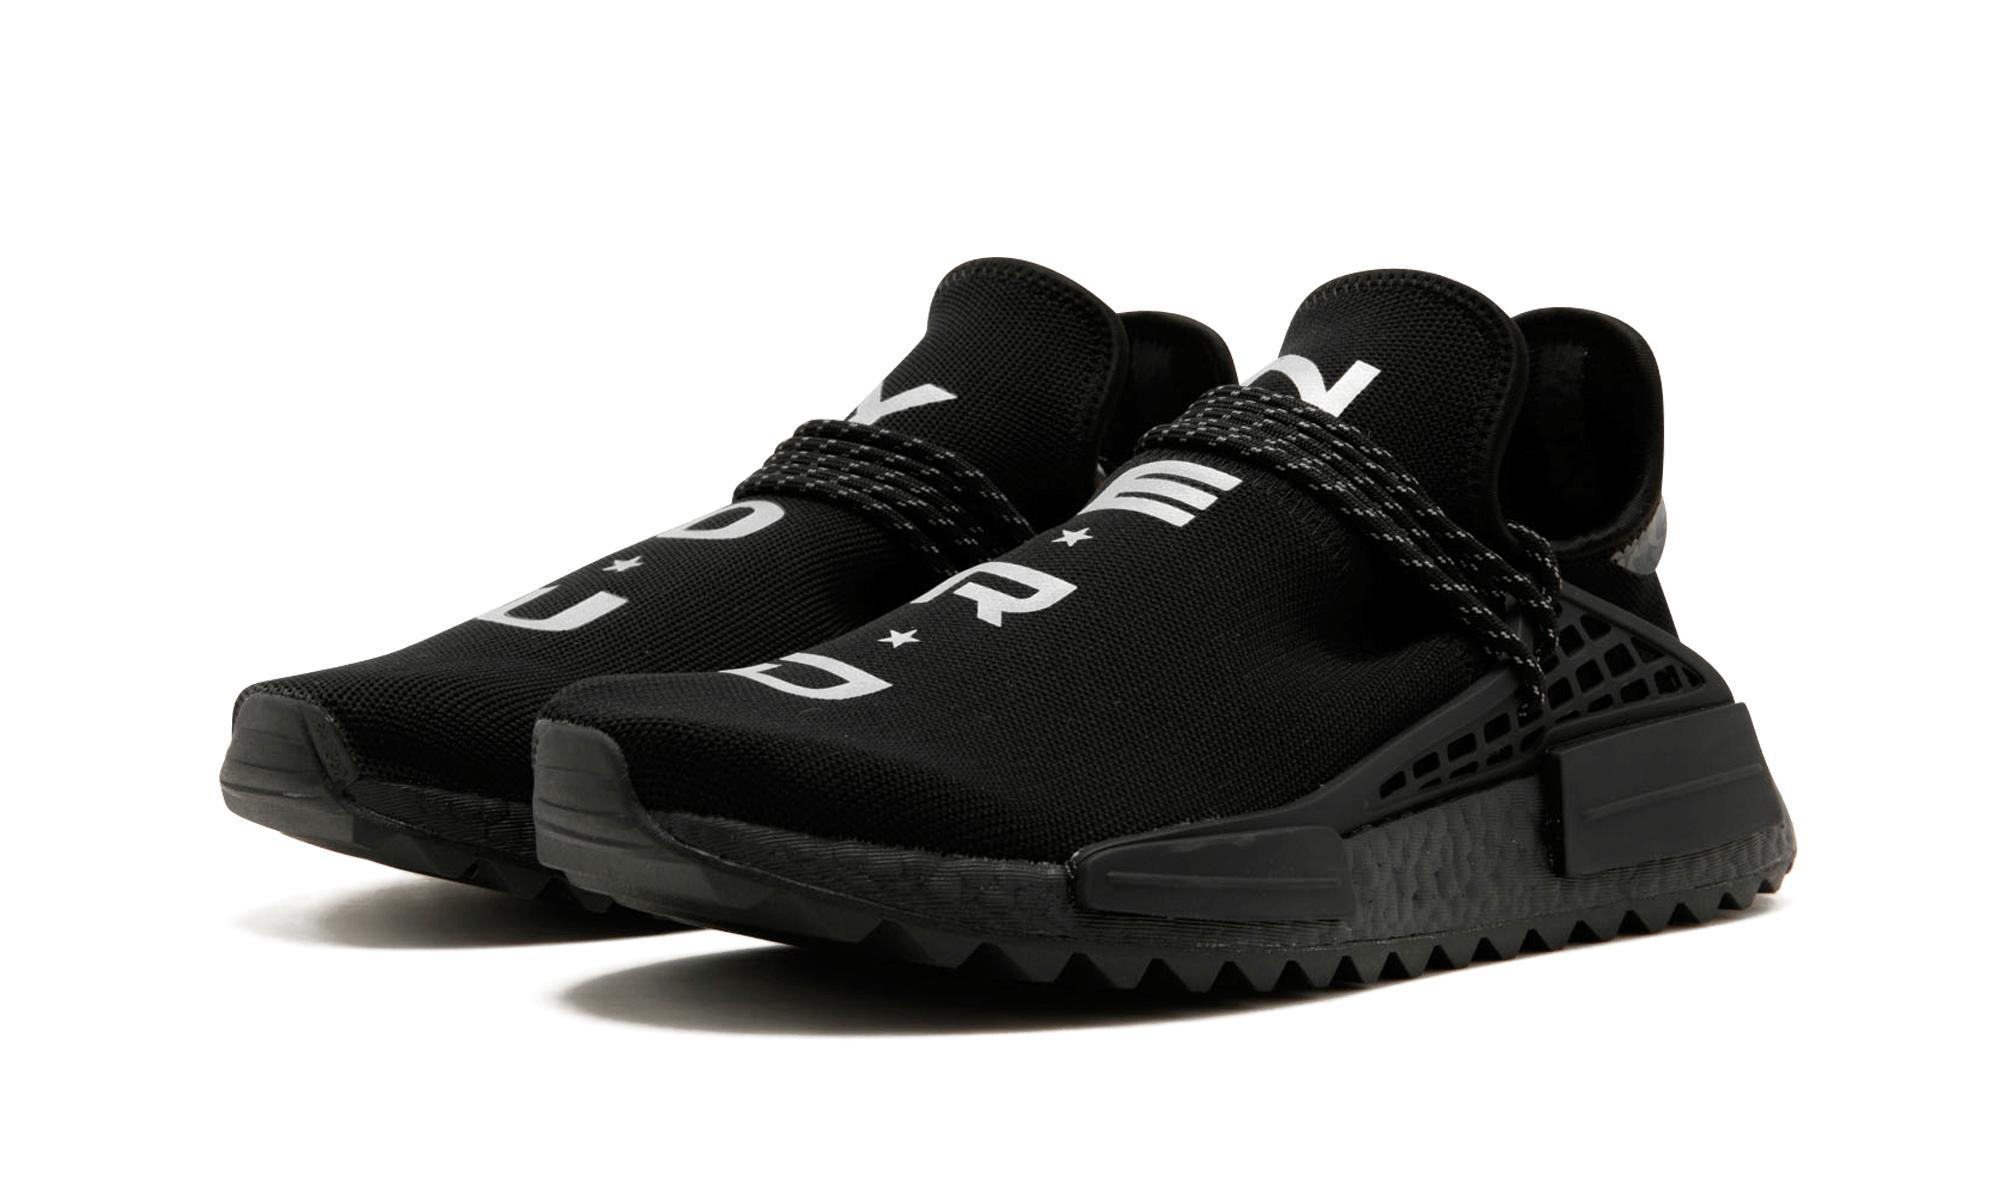 a059a5e9e4e29 Adidas - Black Pw Human Race Nmd Tr for Men - Lyst. View fullscreen